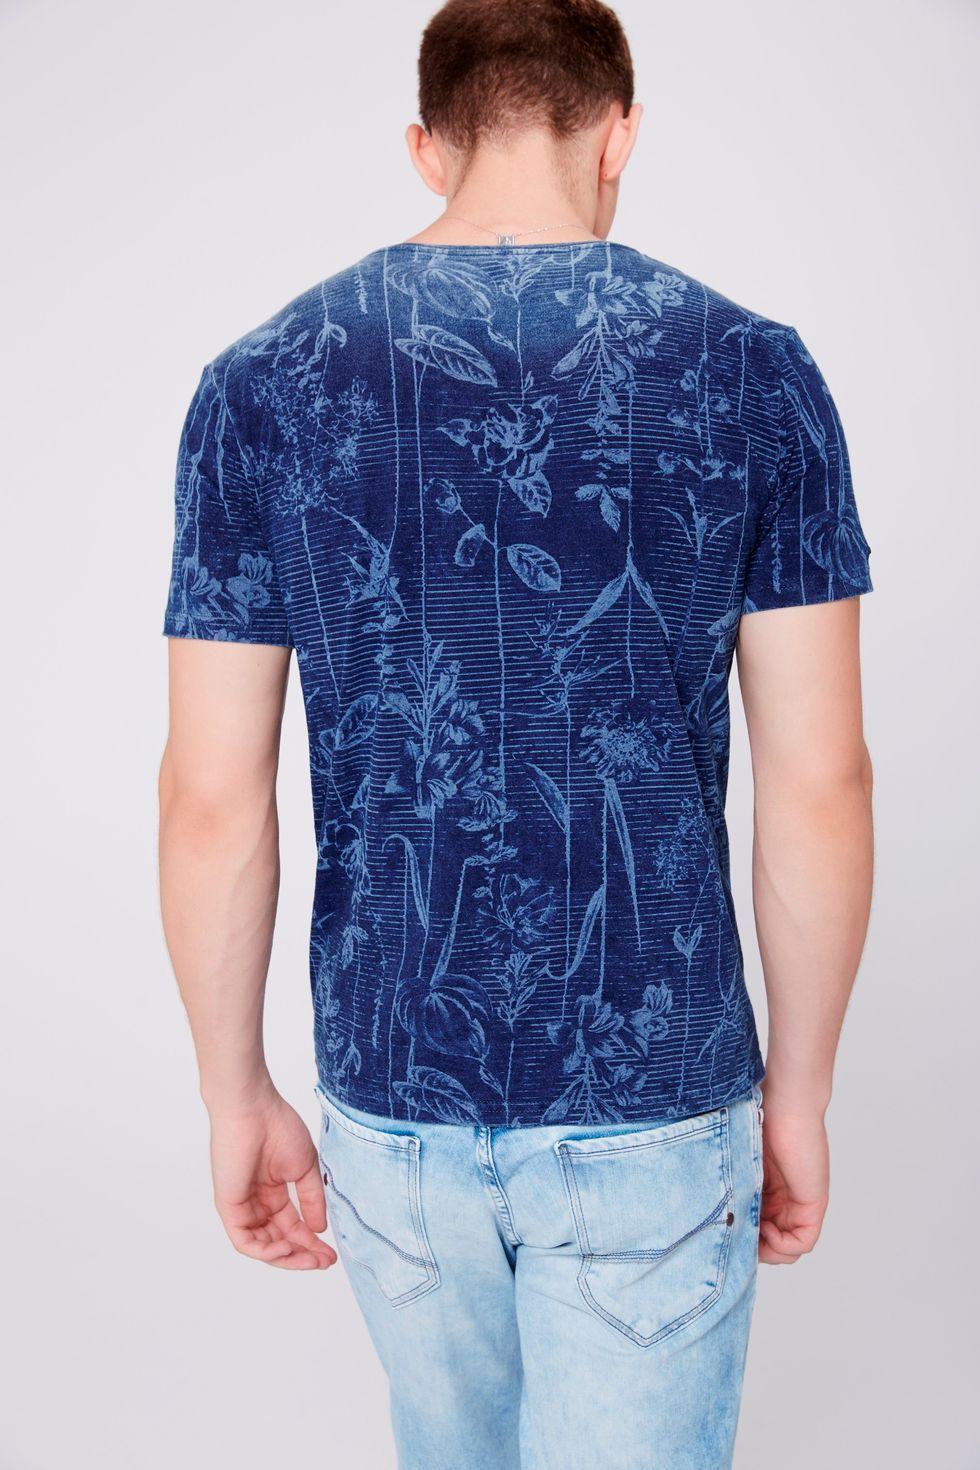 ac74527084 Camiseta Estampada Masculina - Damyller-smartphone